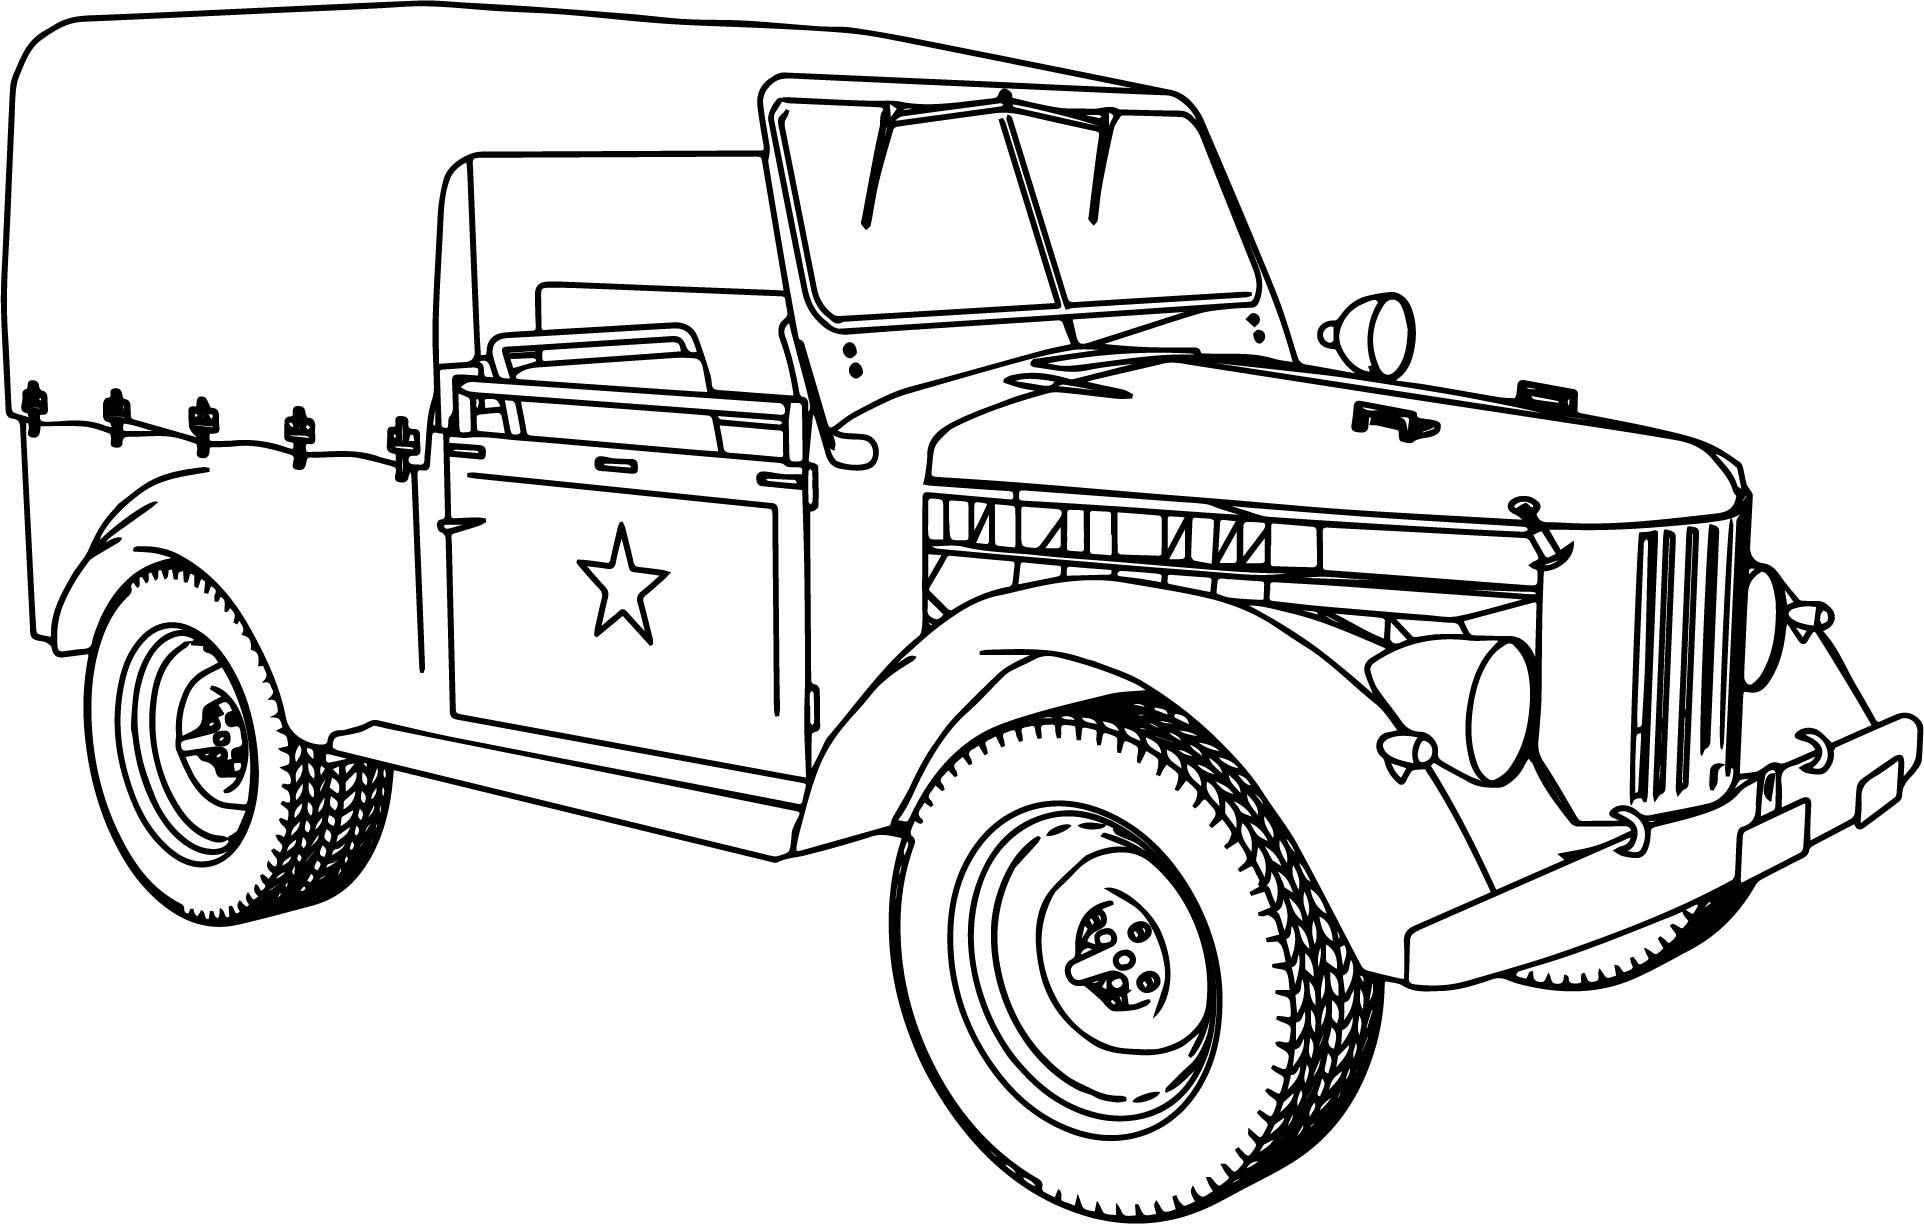 gaz 69 military car coloring page. Black Bedroom Furniture Sets. Home Design Ideas